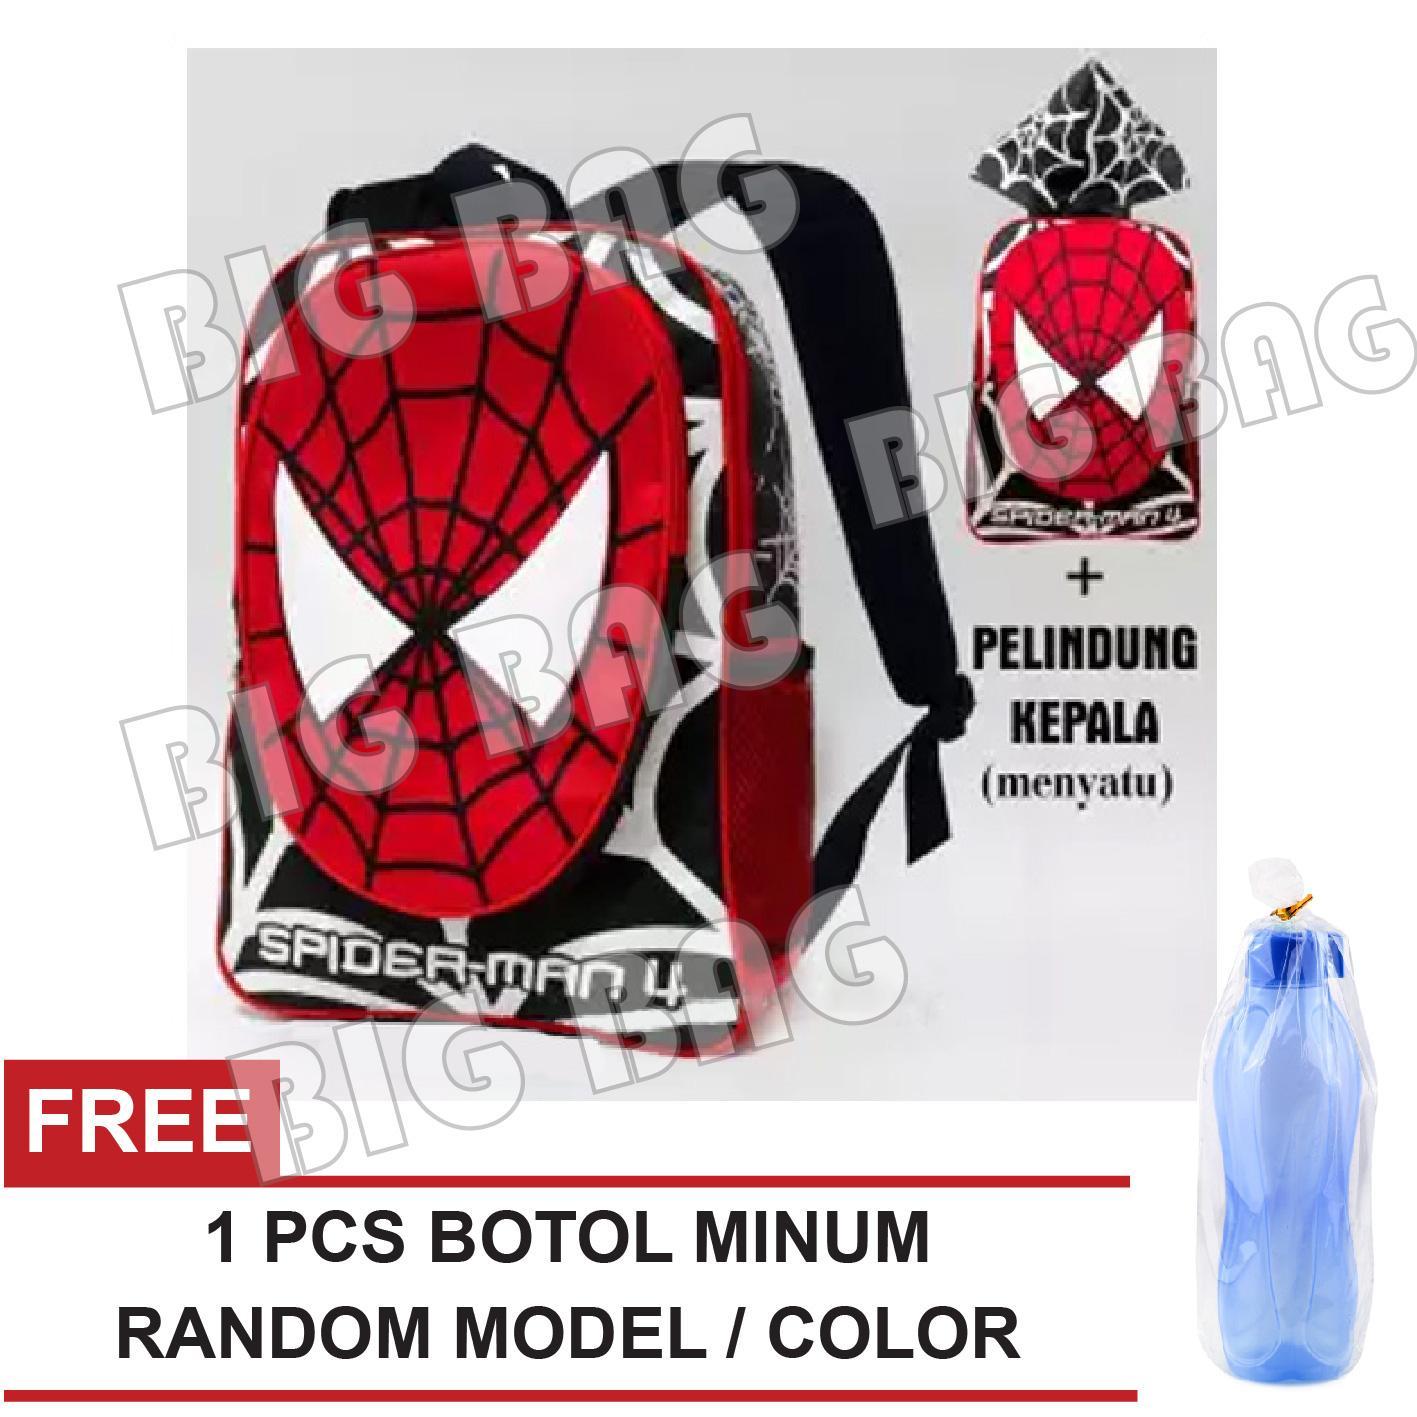 Tas Ransel Anak Laki Laki Karakter - Spiderman Hoodie   Bonus Tutup Kepala  + FREE Botol 8e4125cd2b